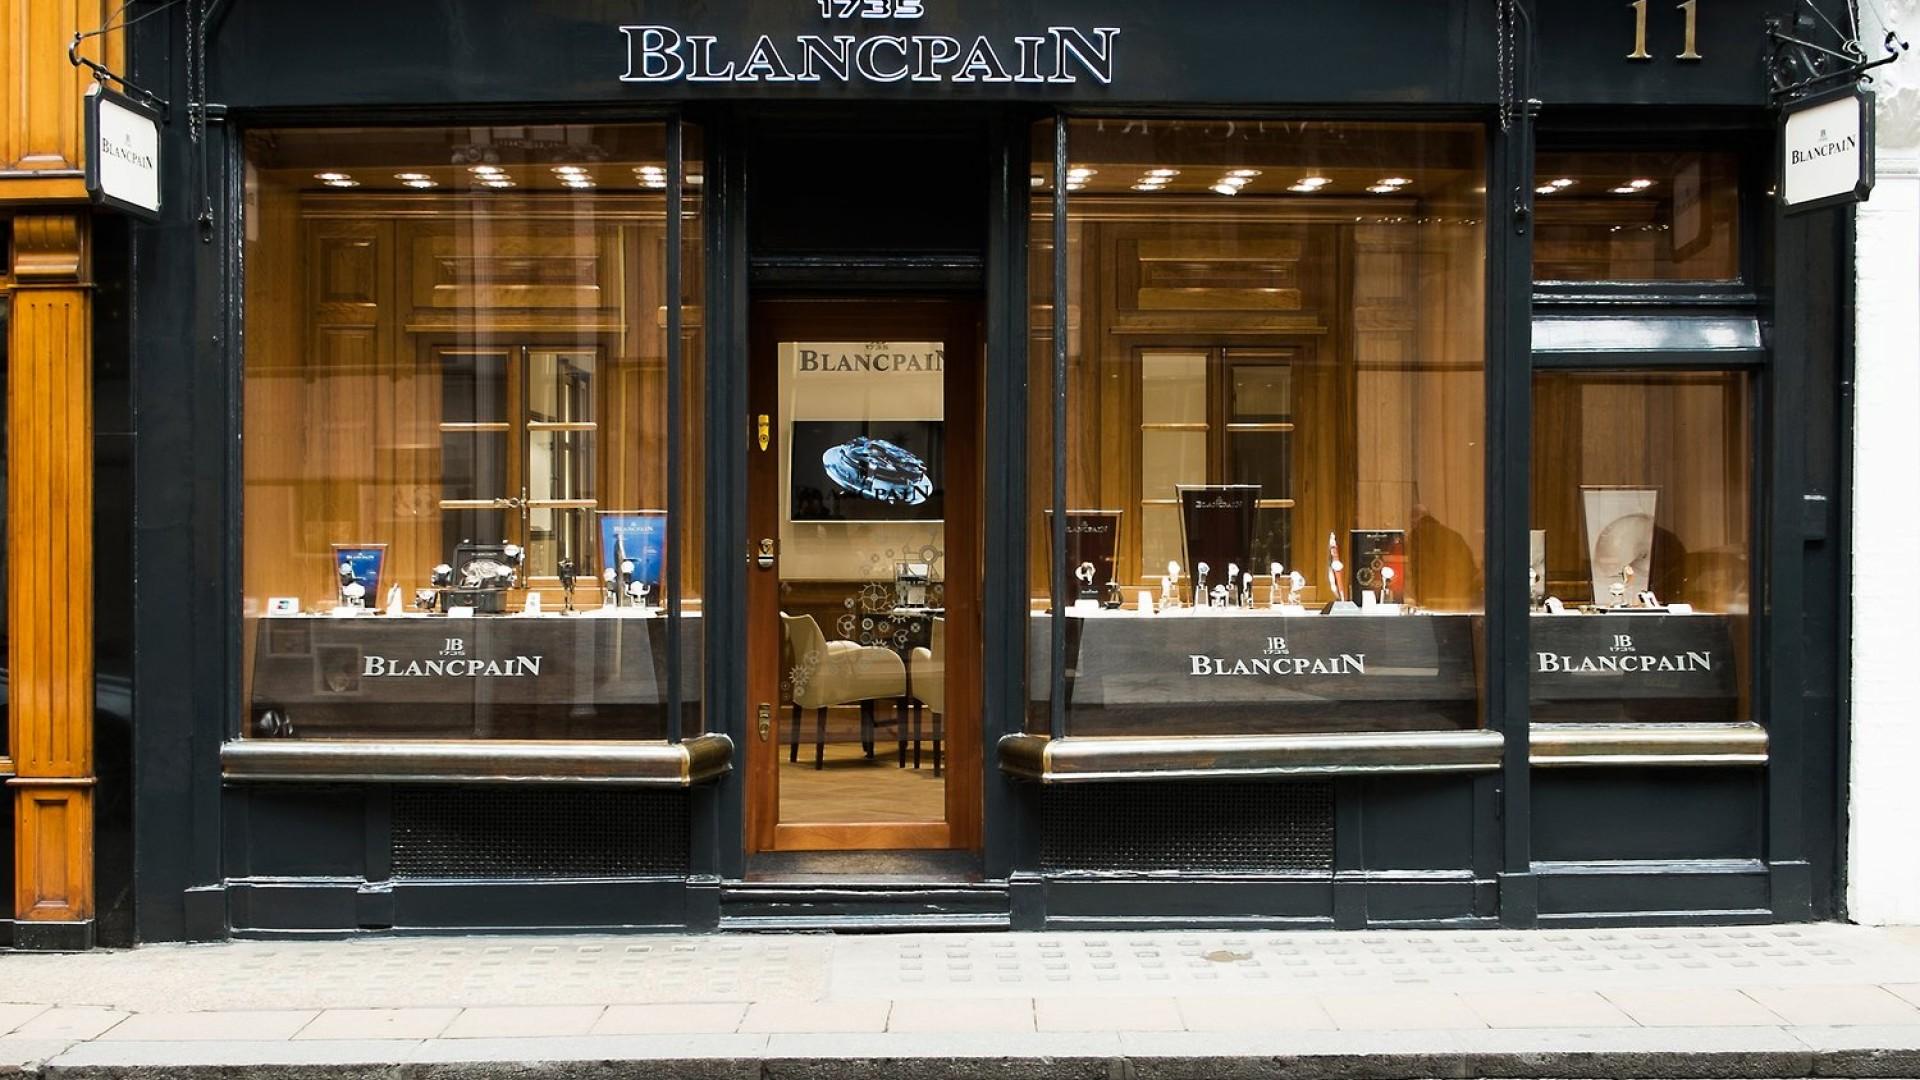 Blancpain, 11 New Bond St. W1S 3SR